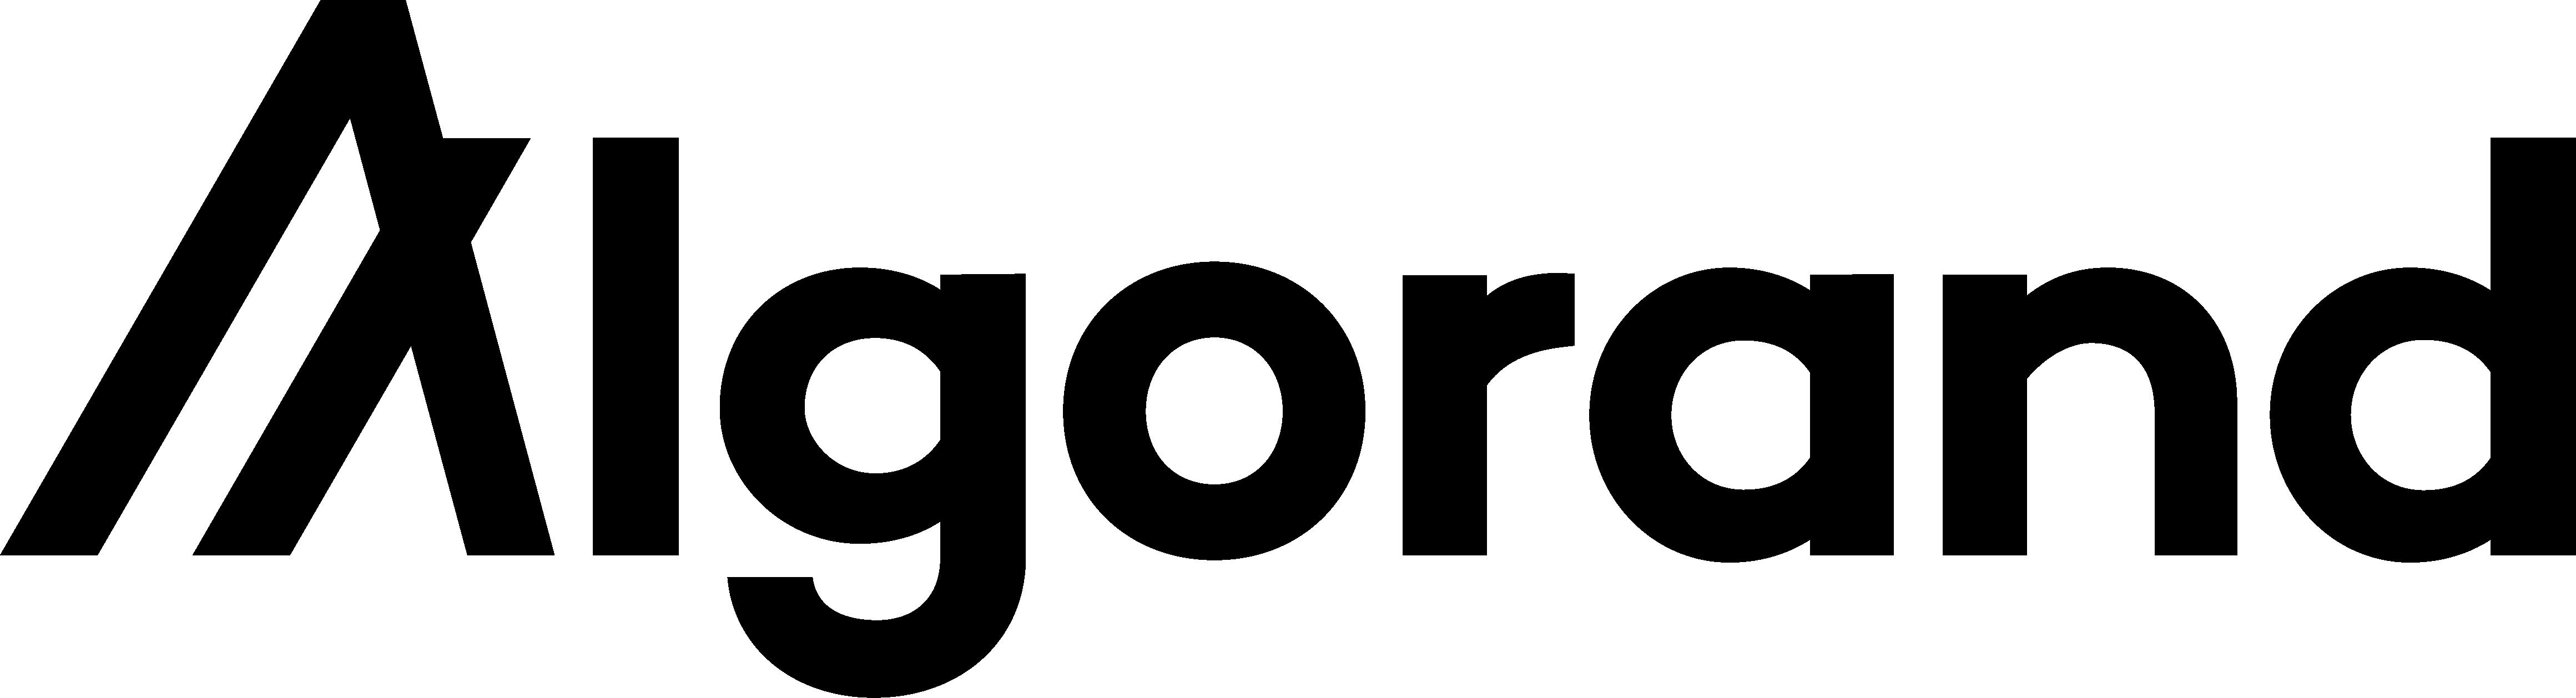 algorand_full_logo_black